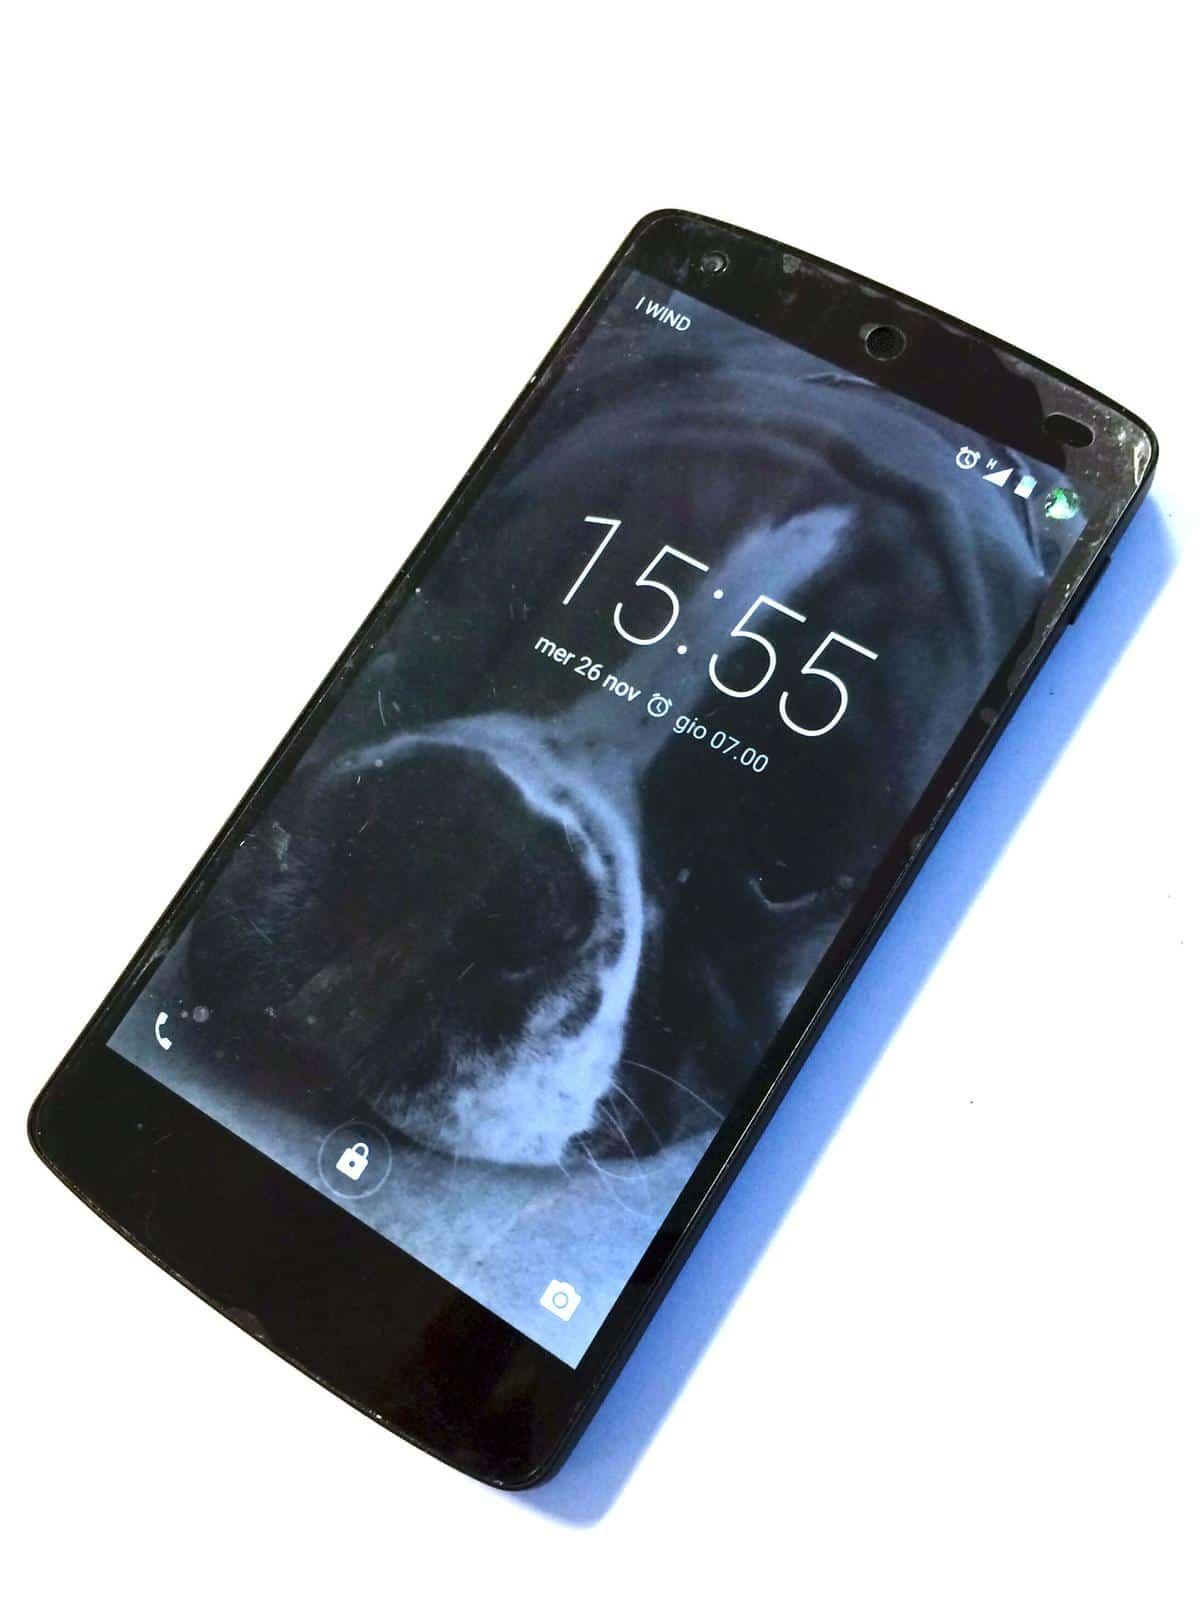 Mini Rencesione Google Nexus 5 Front